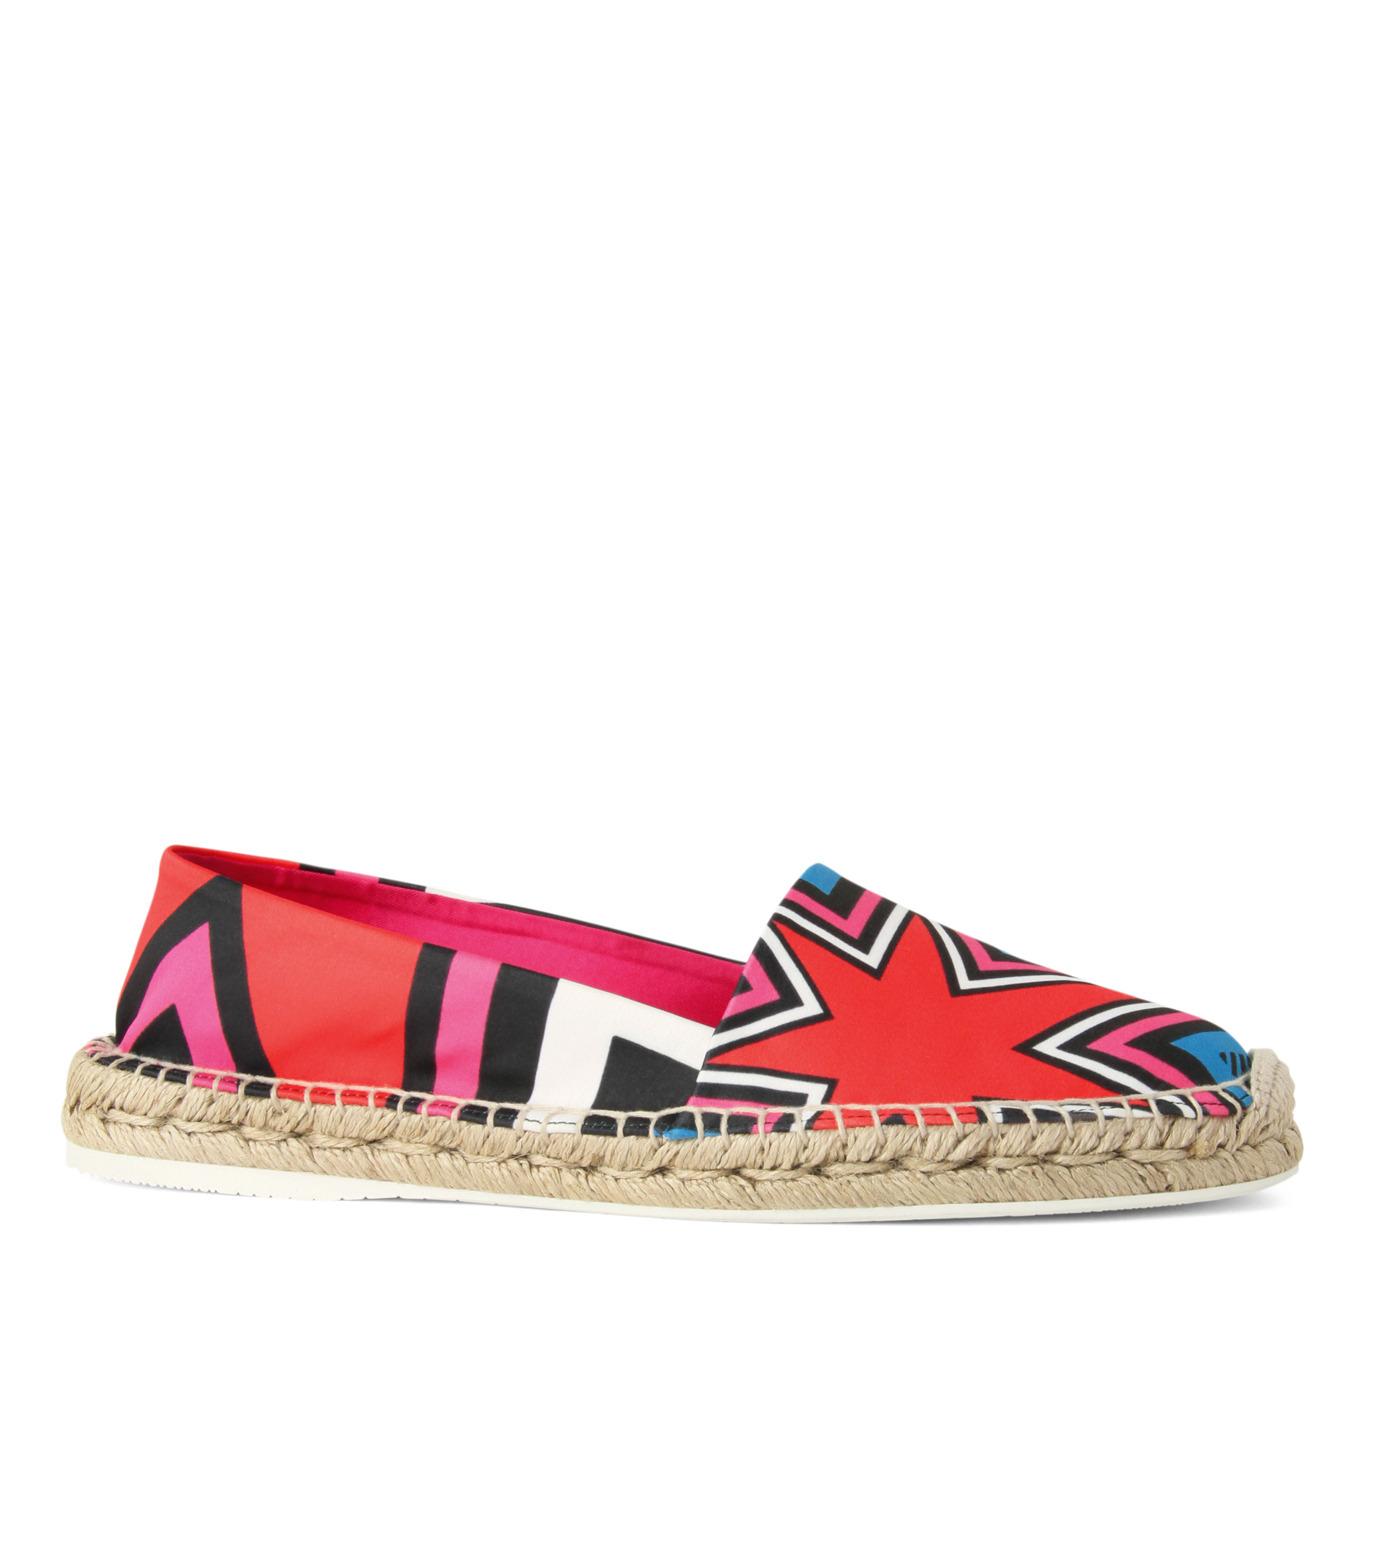 Nicholas  Kirkwood(ニコラス カークウッド)のEspadrille Loafer-MULTI COLOUR(シューズ/shoes)-15SF012-9 拡大詳細画像1